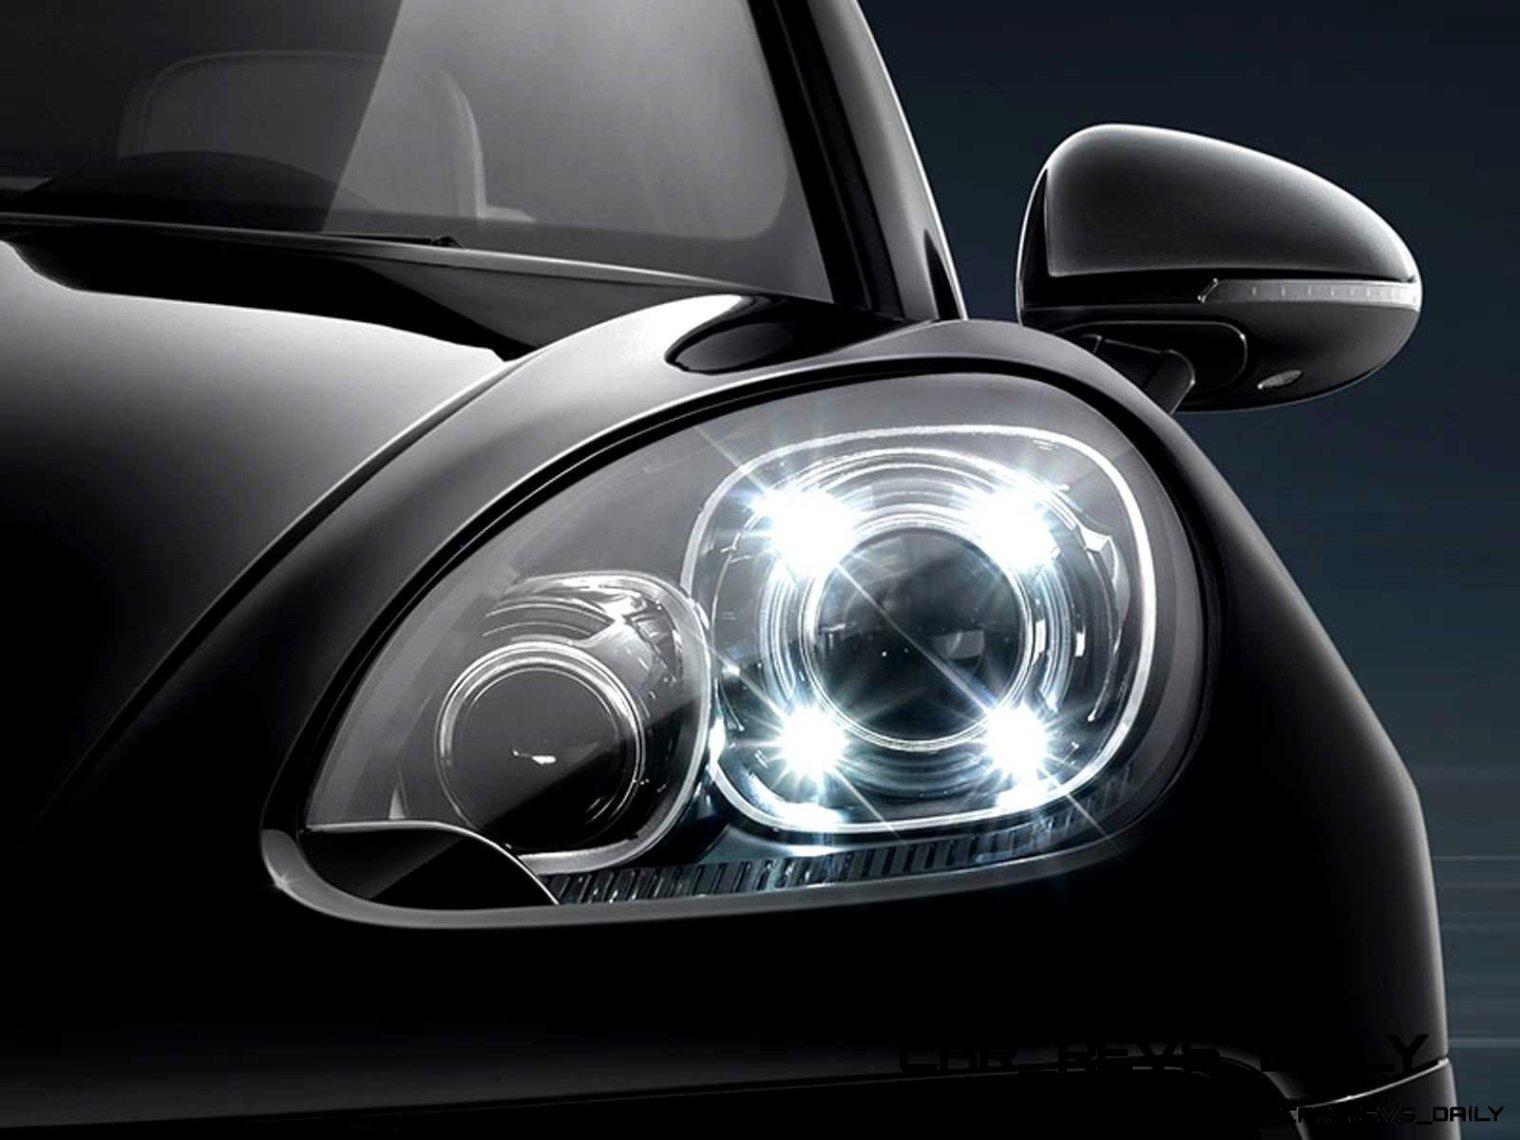 2015 Porsche Macan - Latest Images - CarRevsDaily.com 59